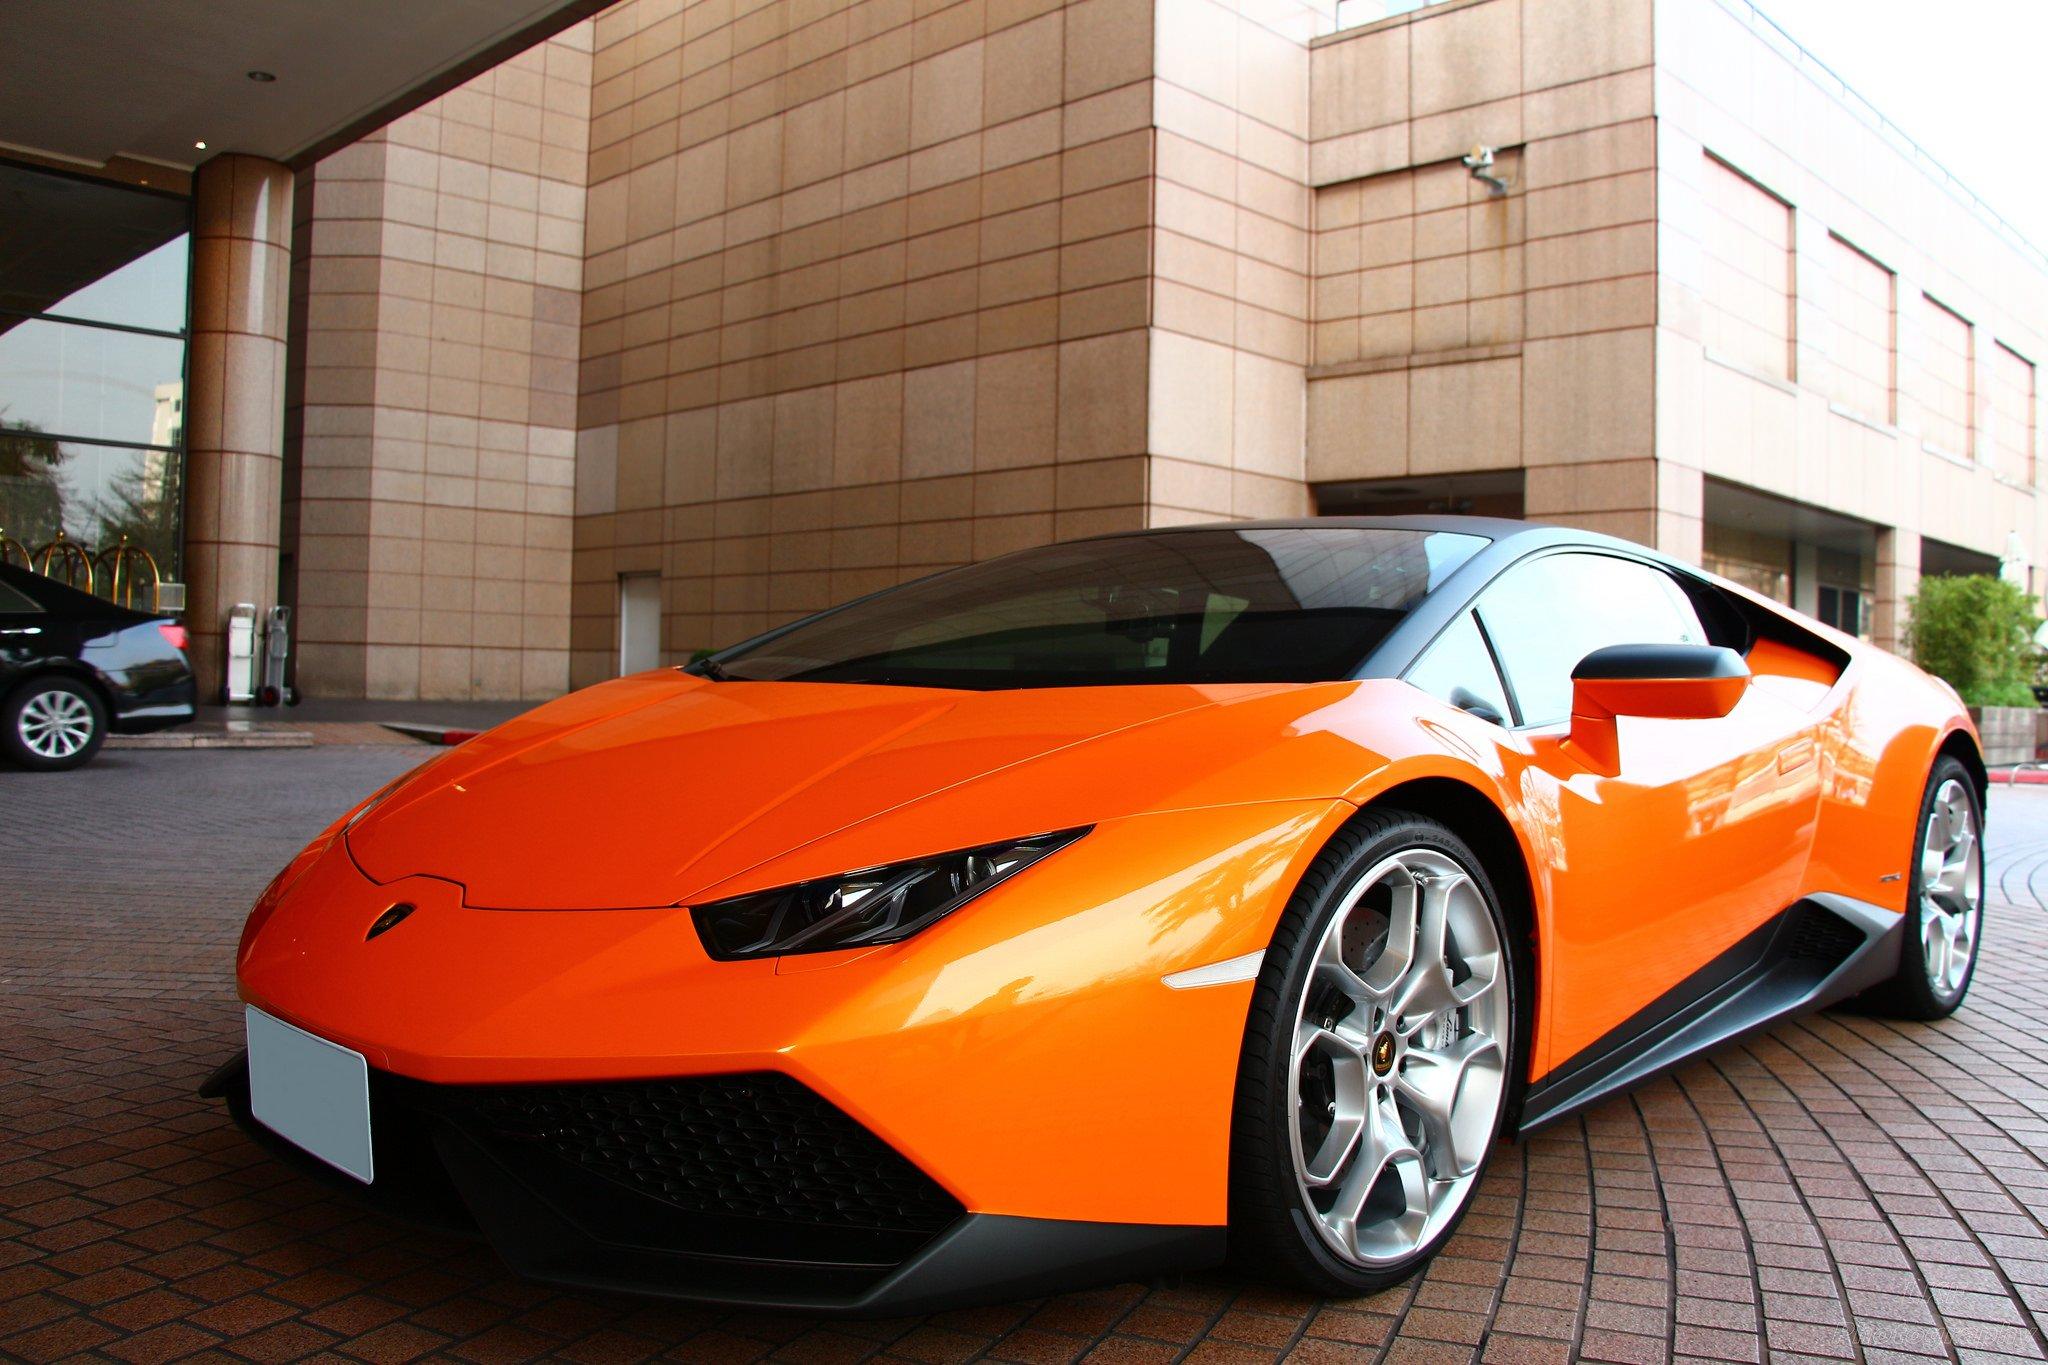 2016 Orange Lamborghini Huracan Wallpapers Hd 17770 Full Hd 2016